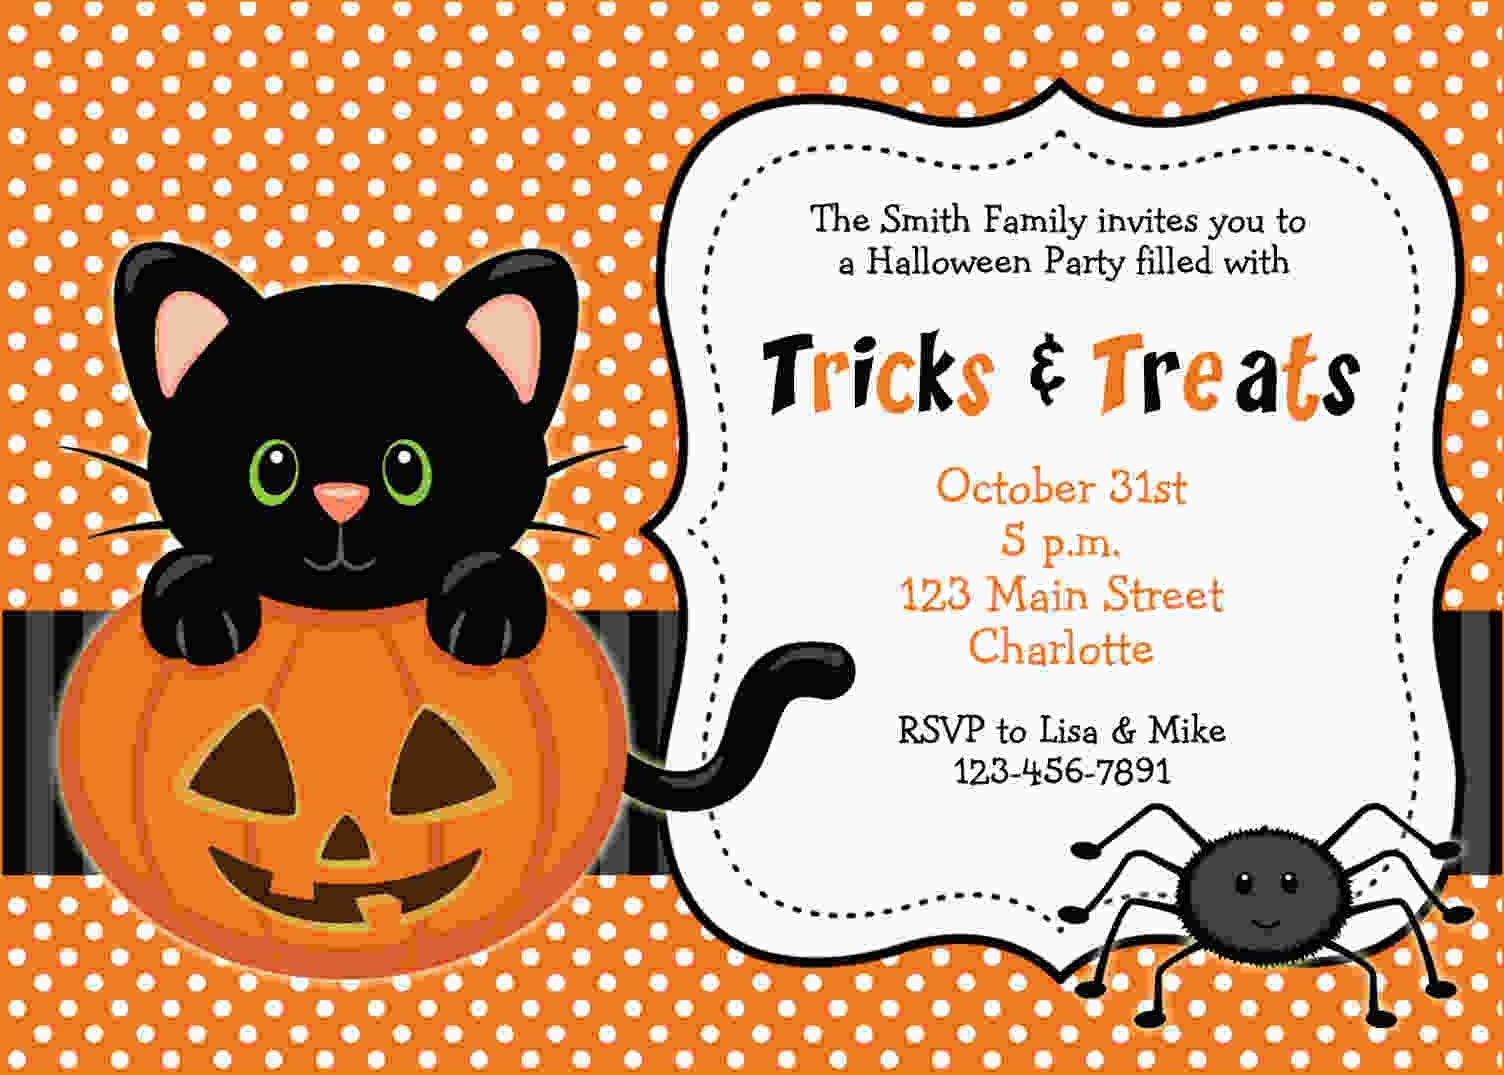 Free Printable Halloween Invitations   Free Printable Birthday - Free Online Halloween Invitations Printable